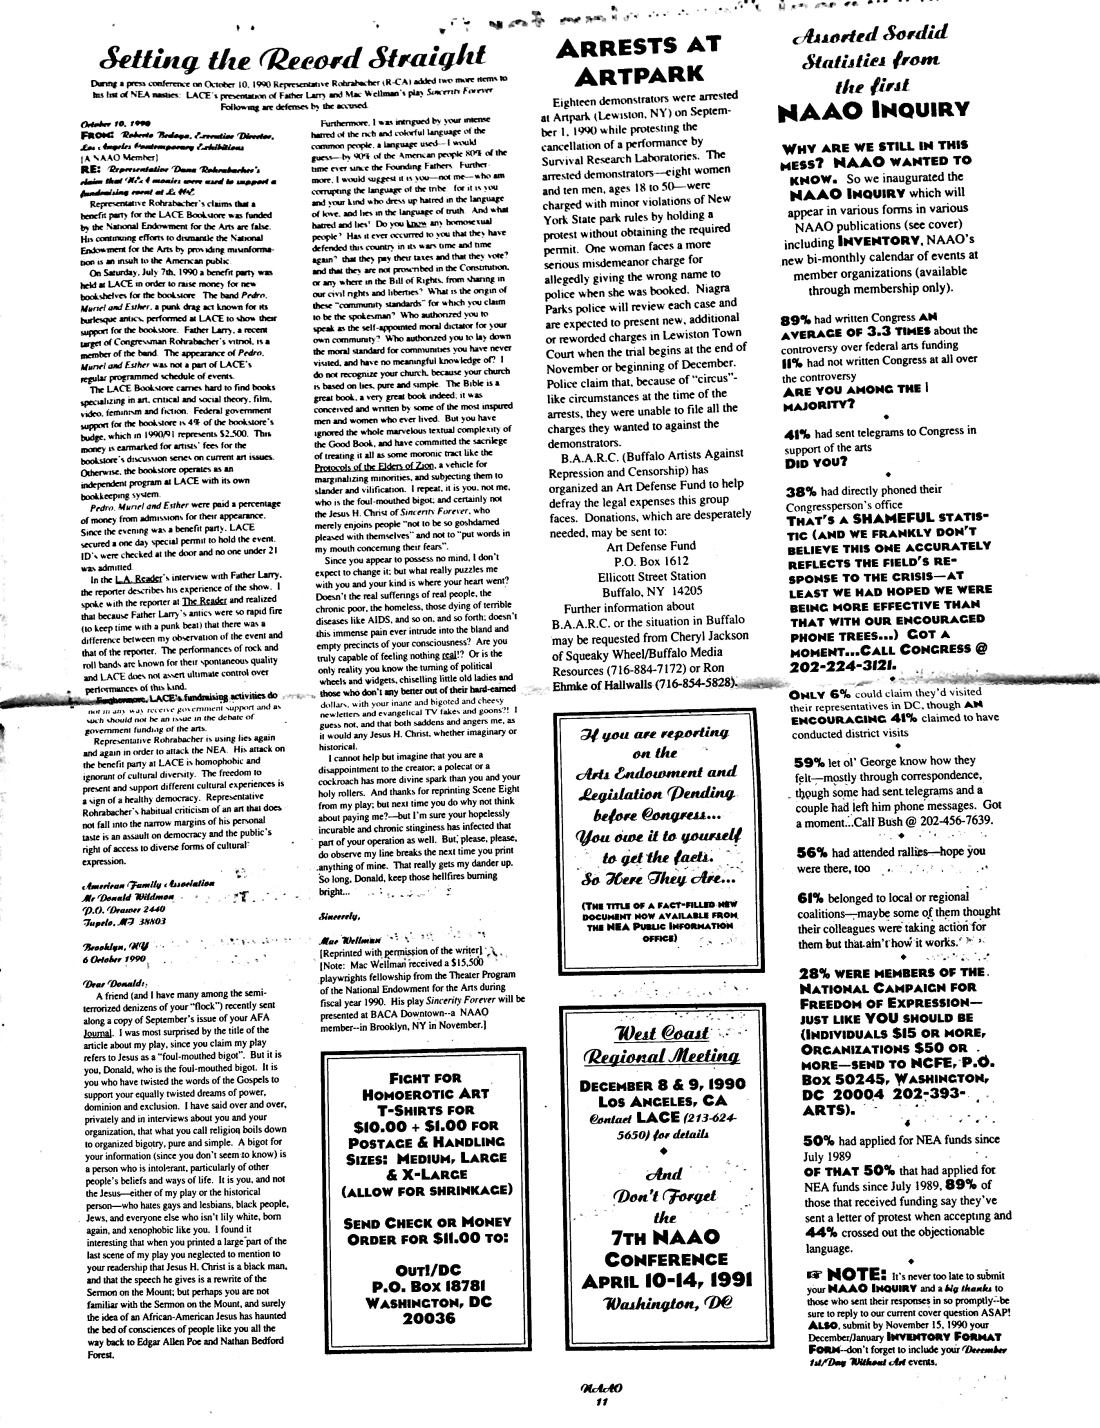 October 1990 - NAAO Bulletin Page 11.jpg